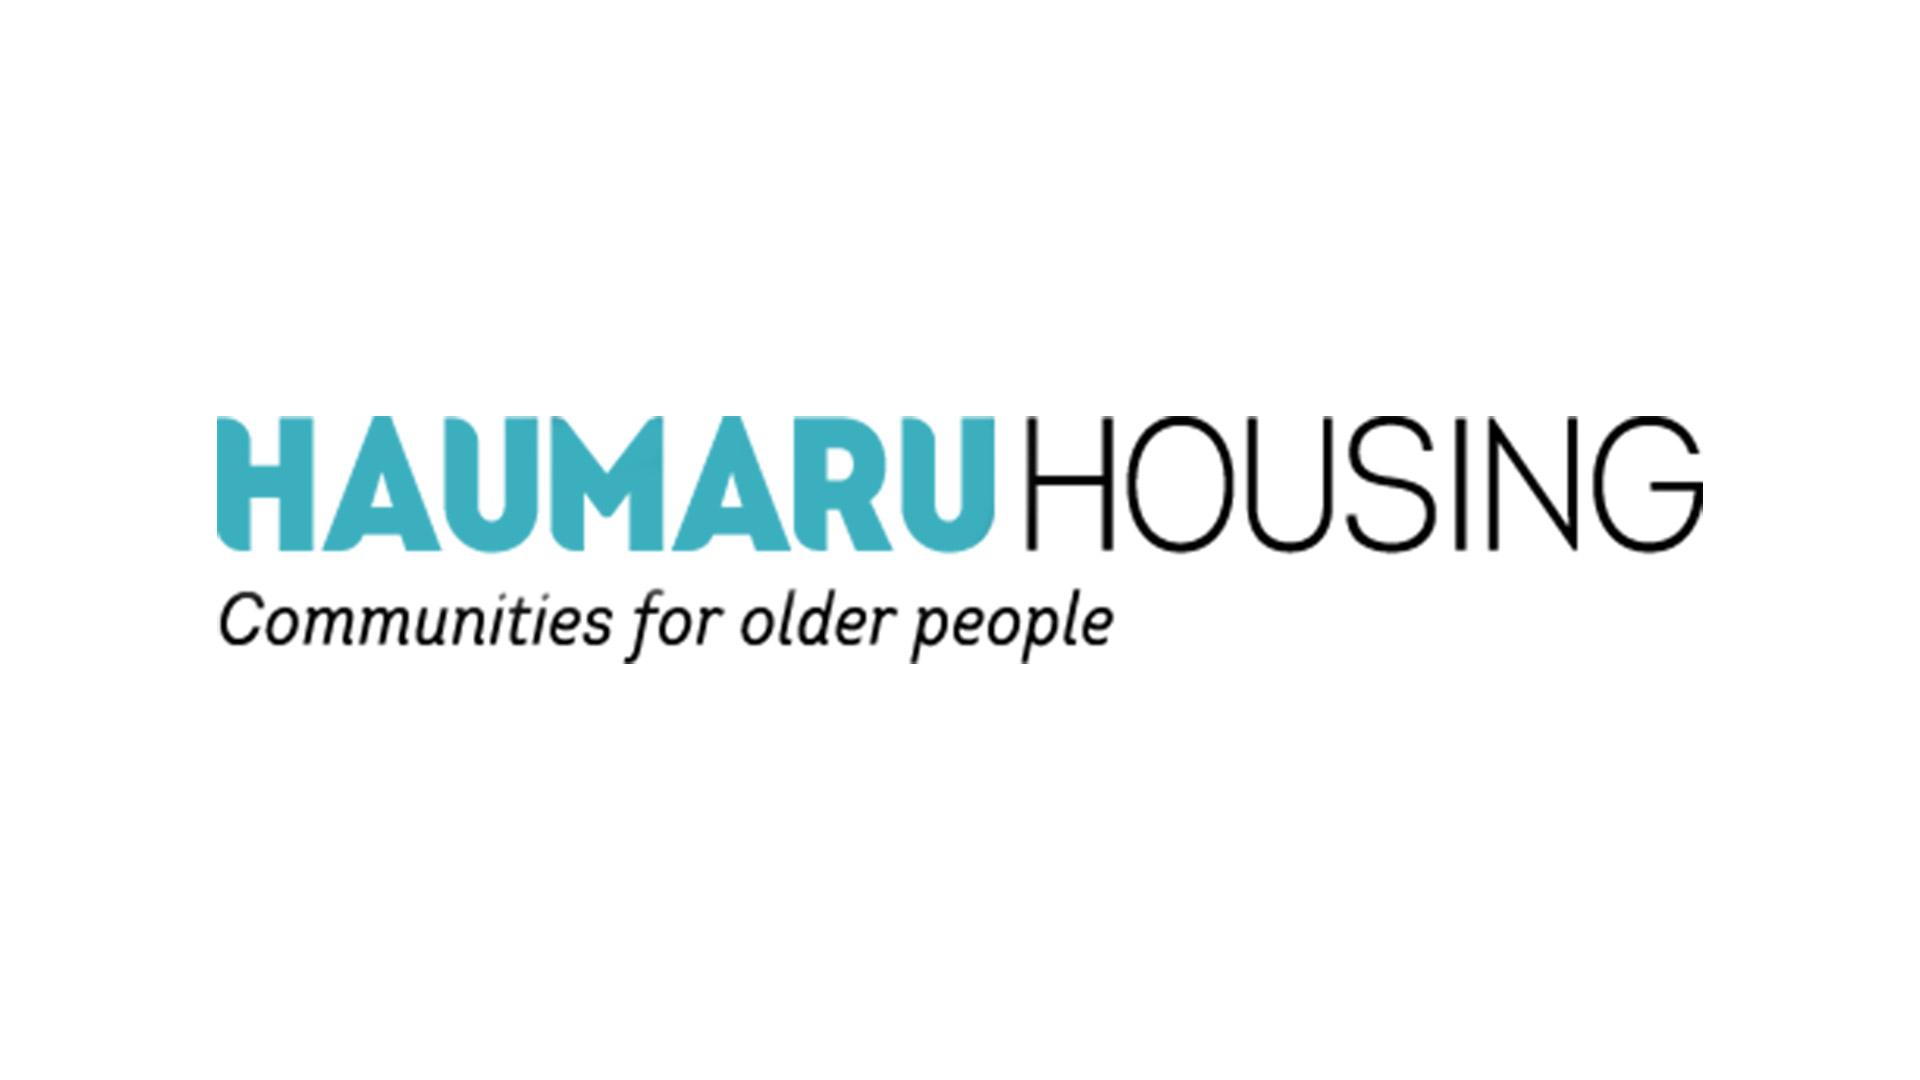 Haumaru Housing